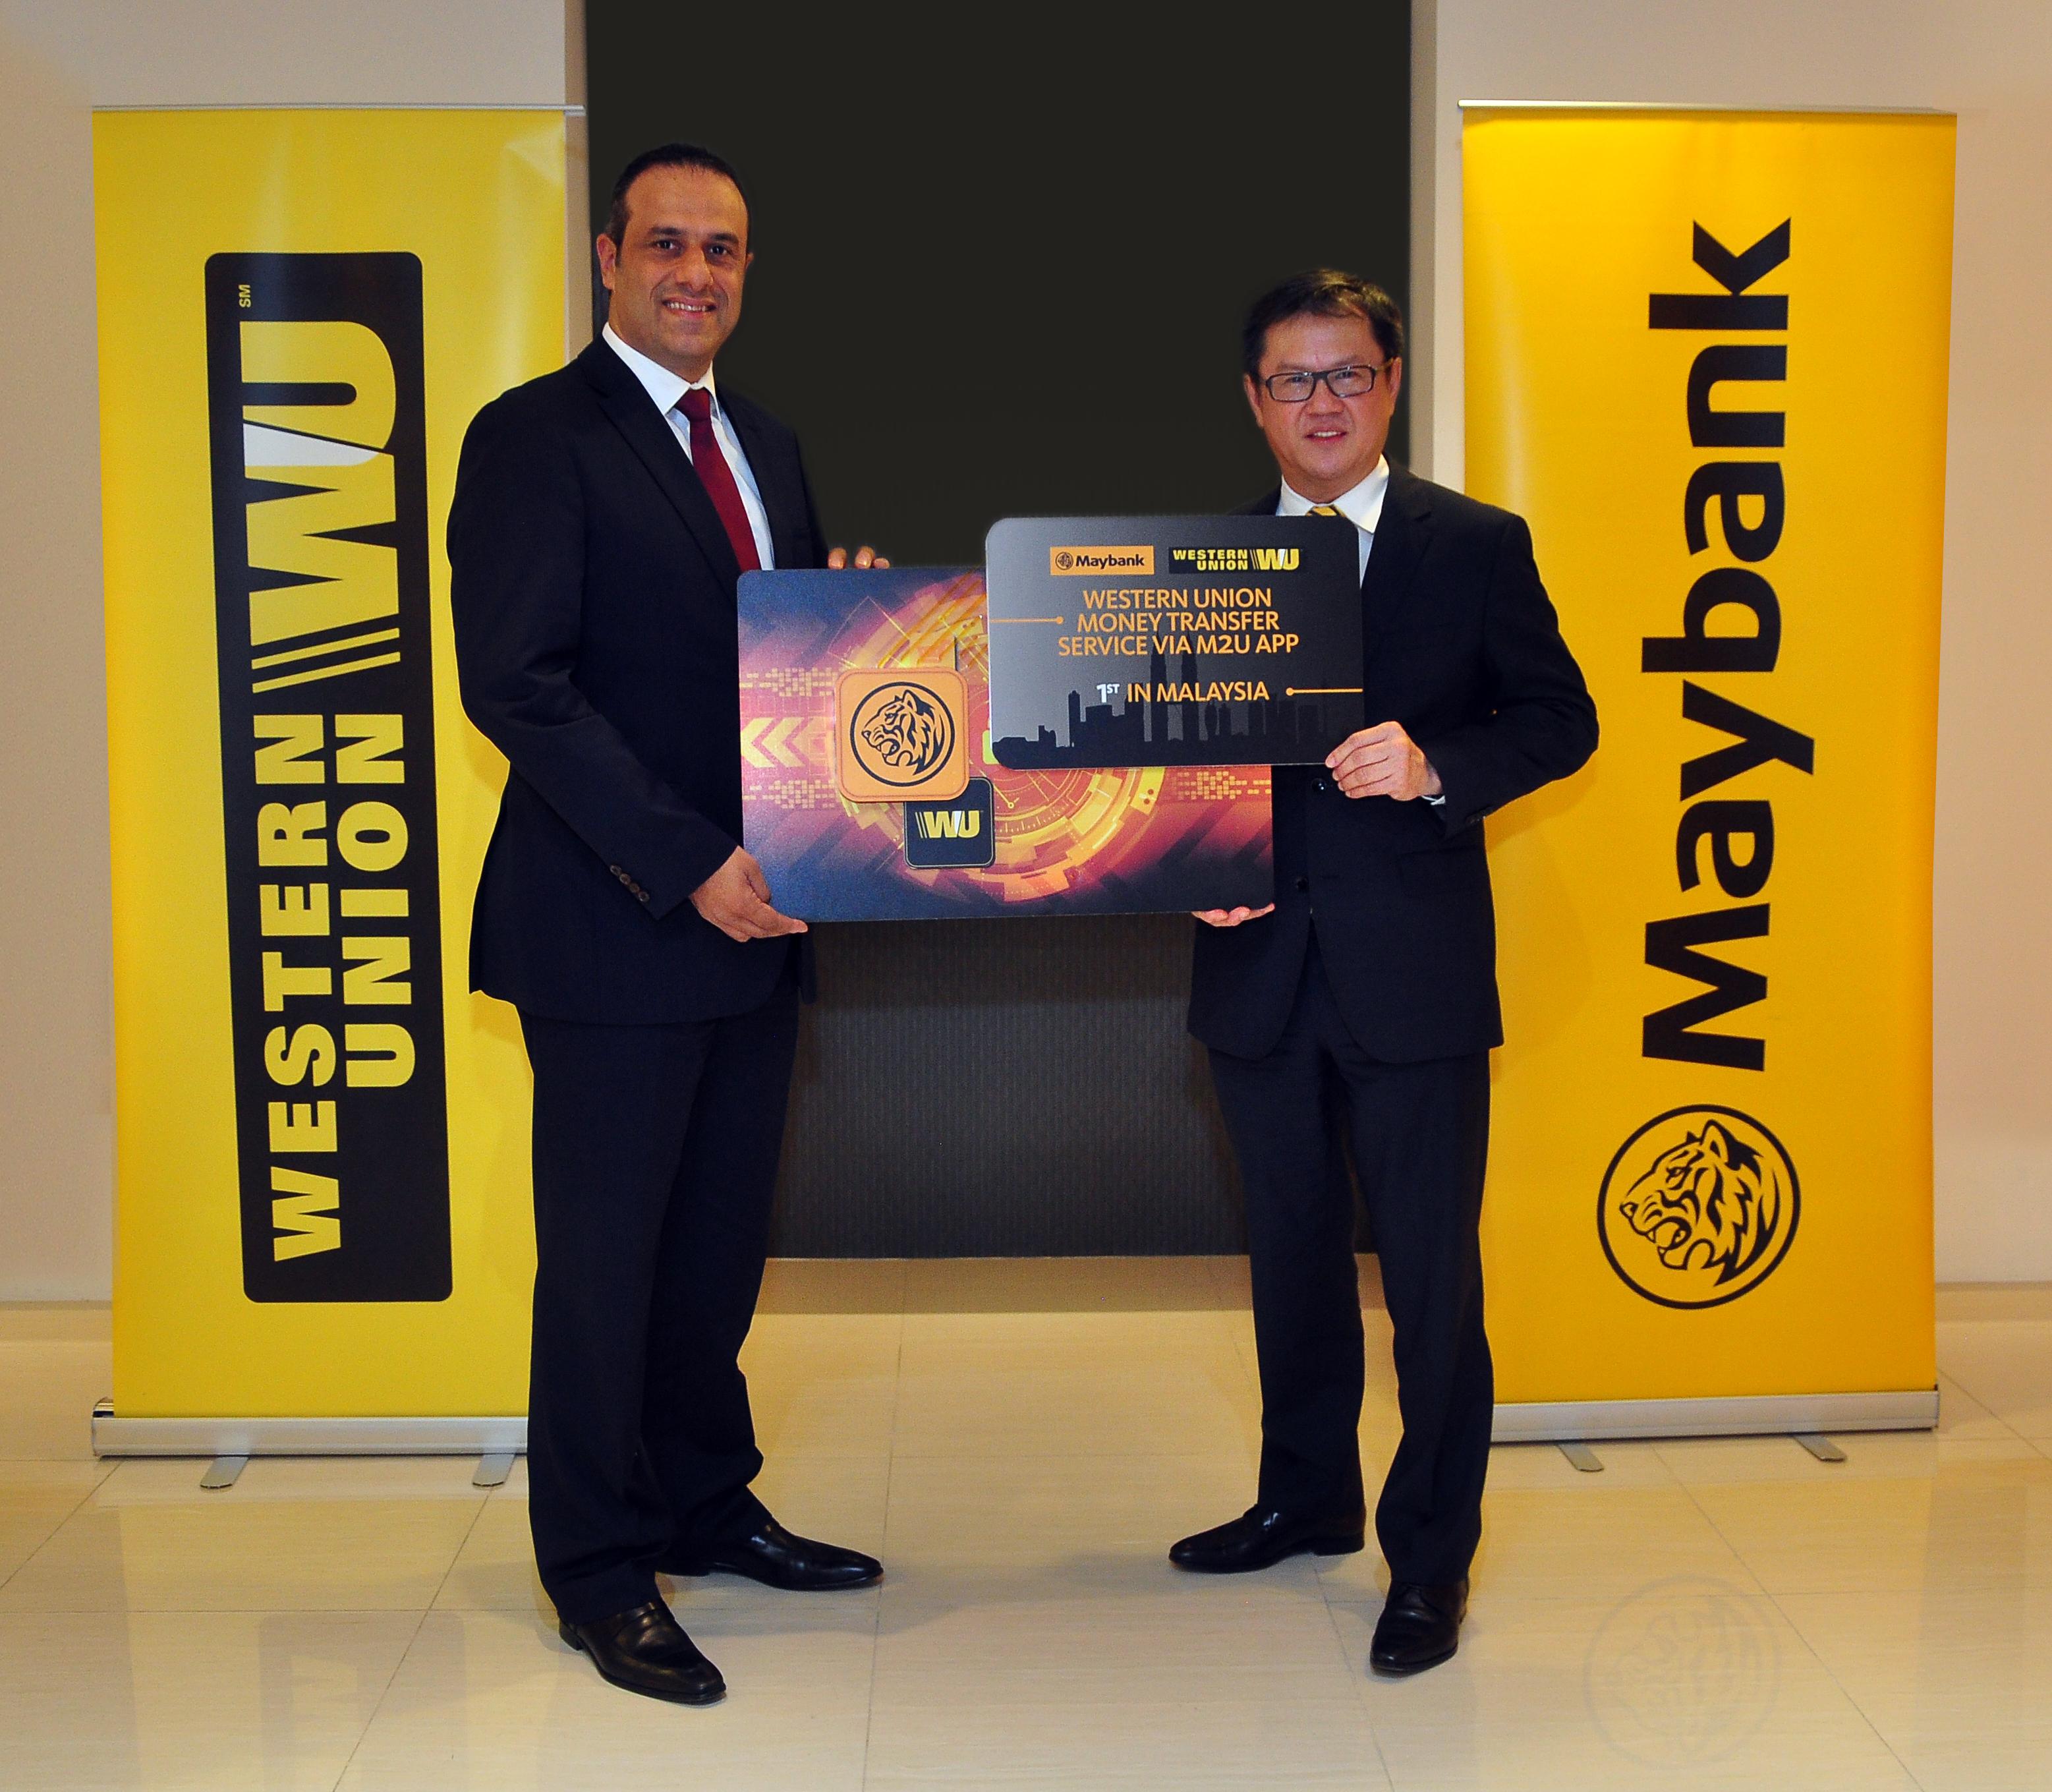 Maybank Launch Money Transfer